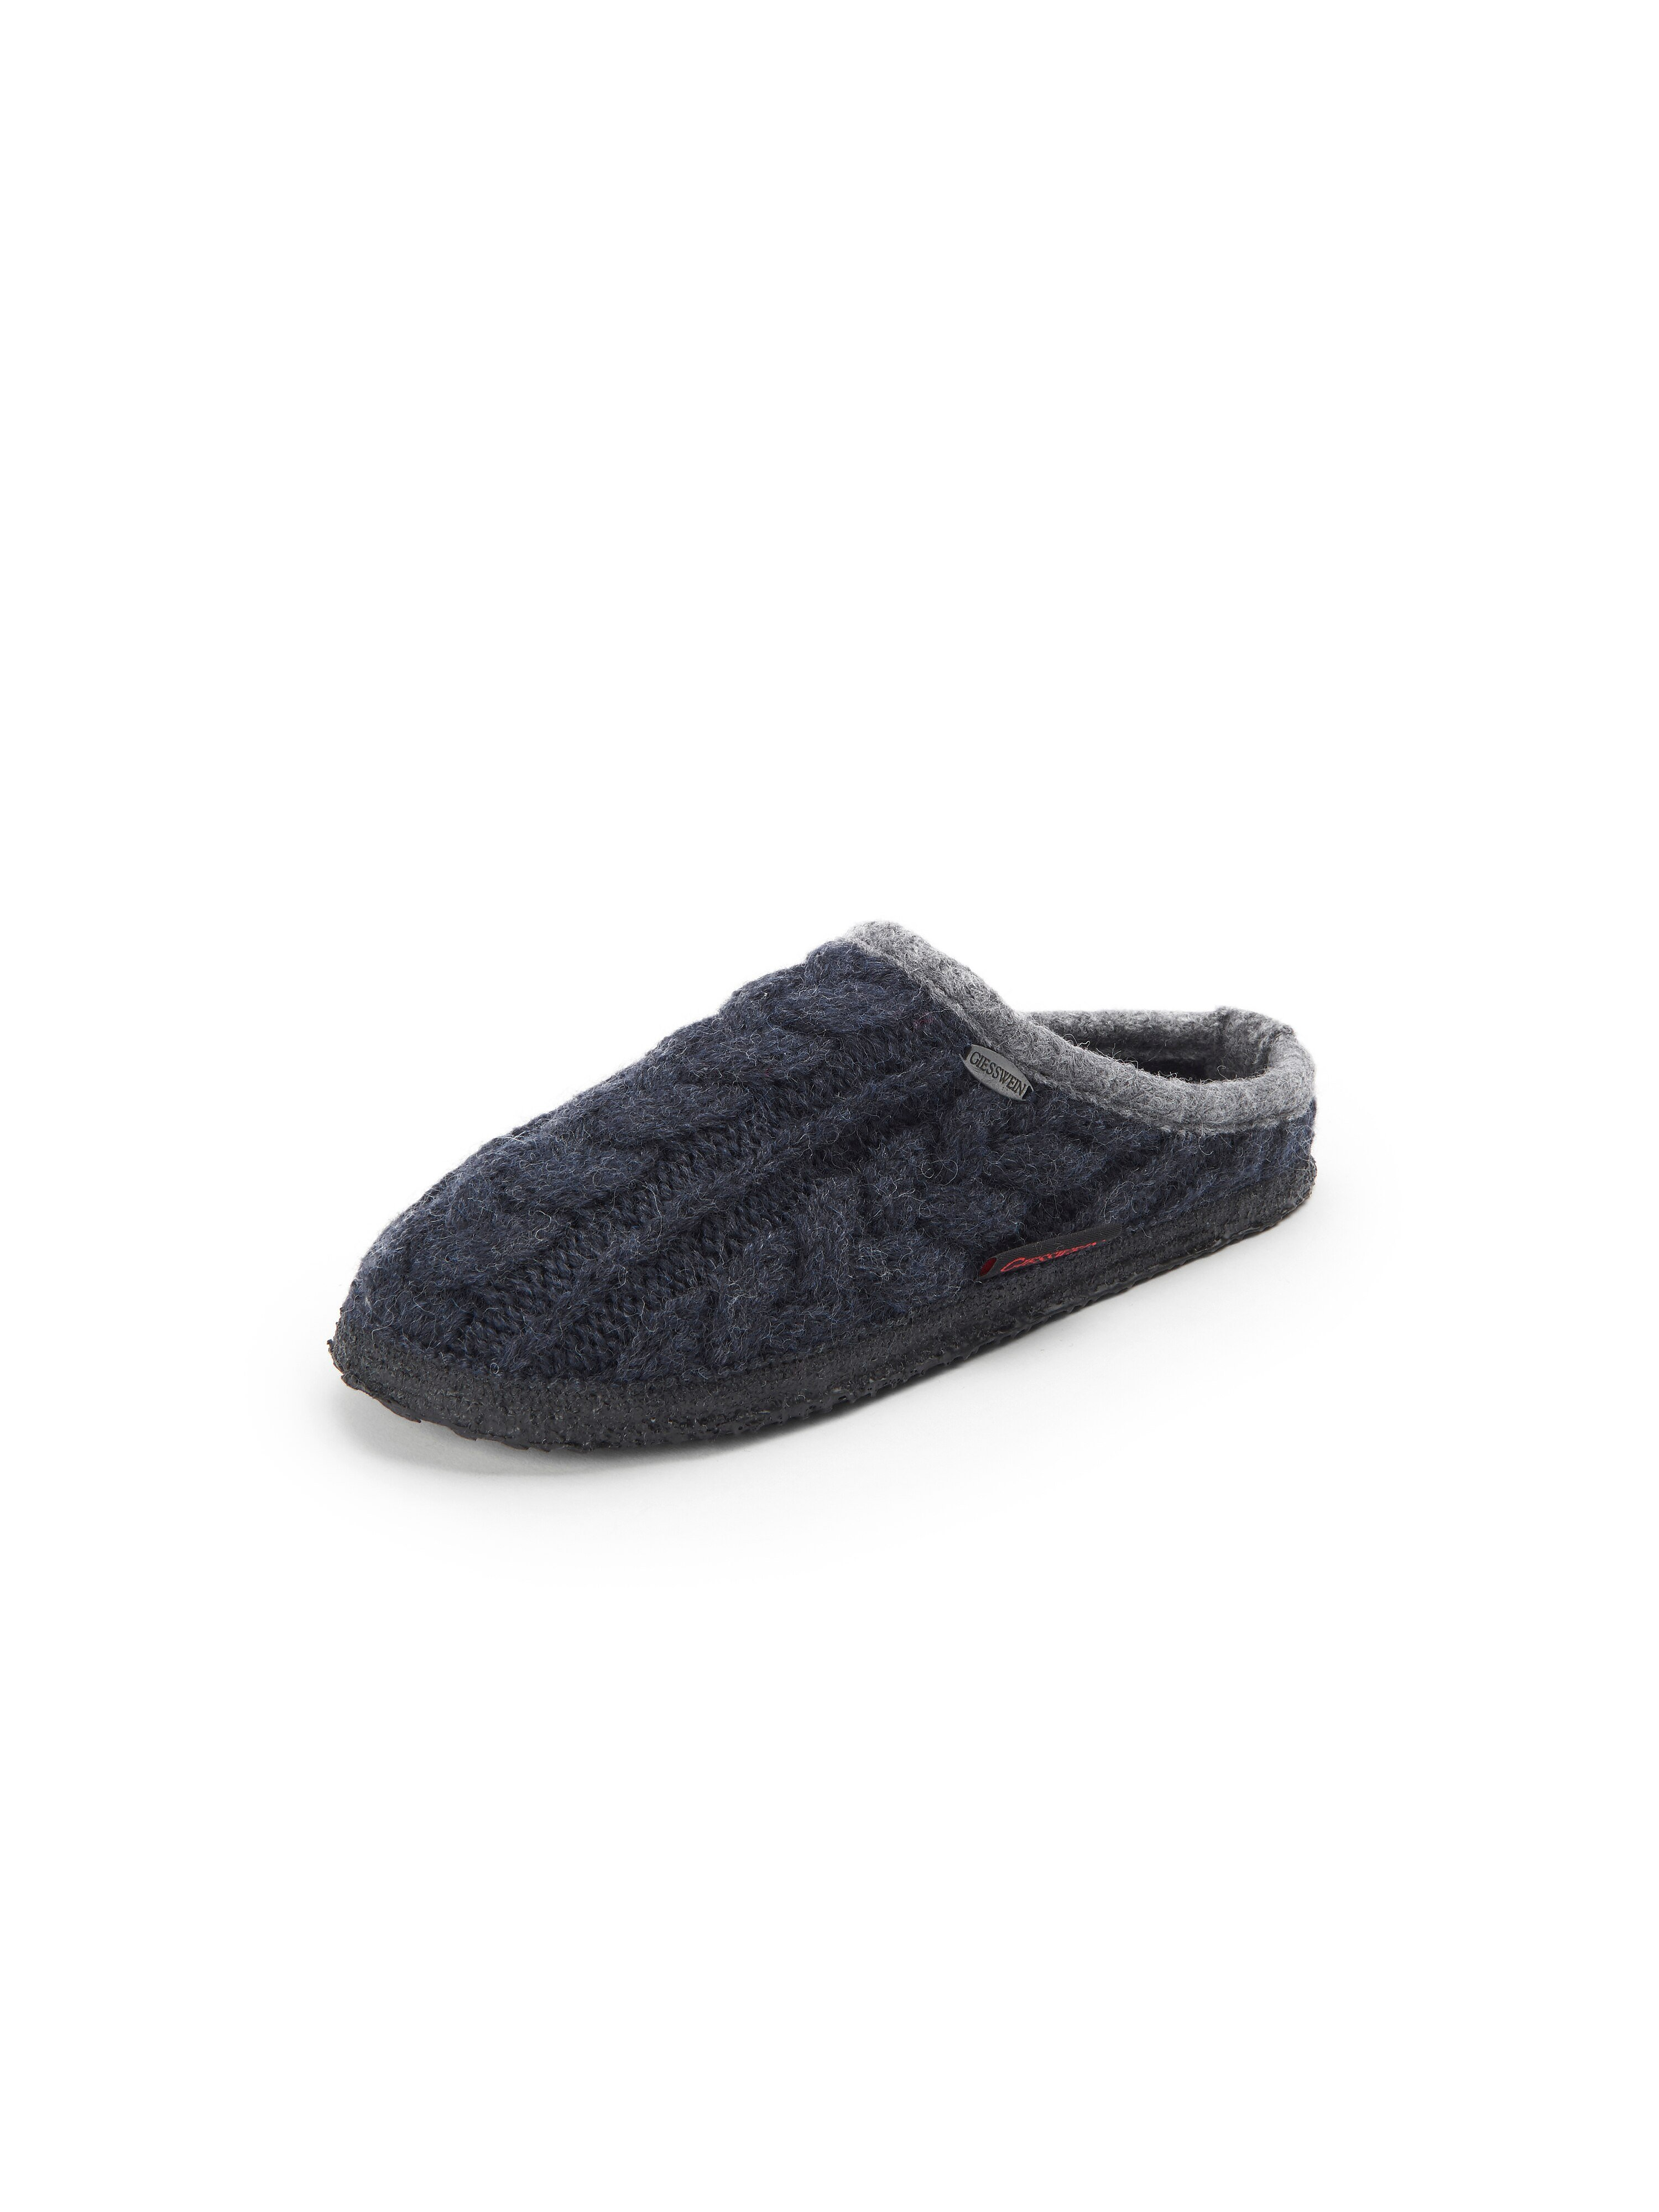 Pantoffels Van Giesswein blauw